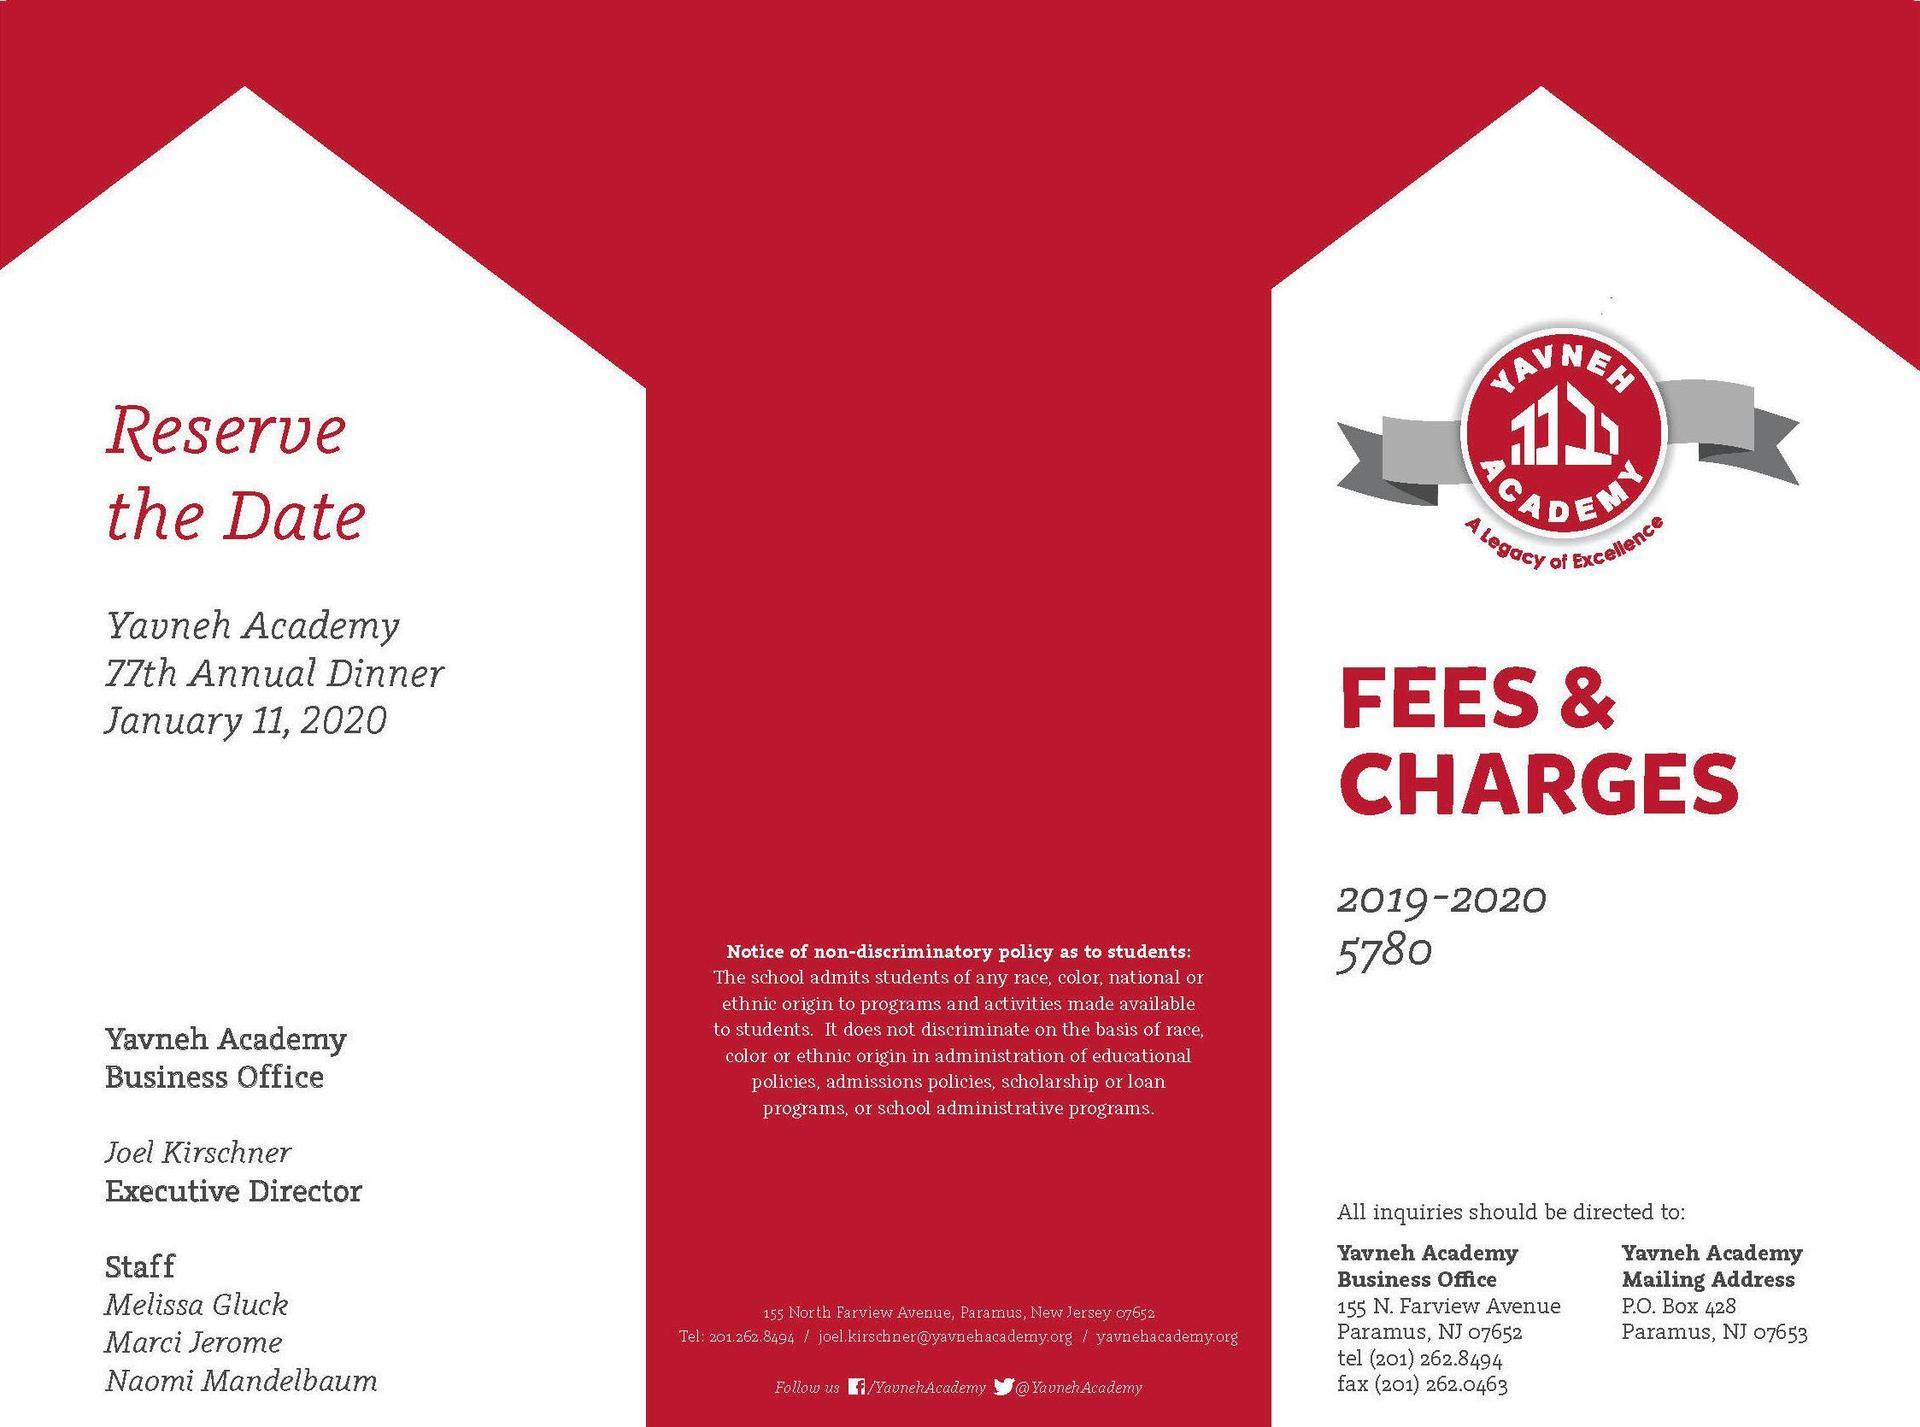 fee schedule